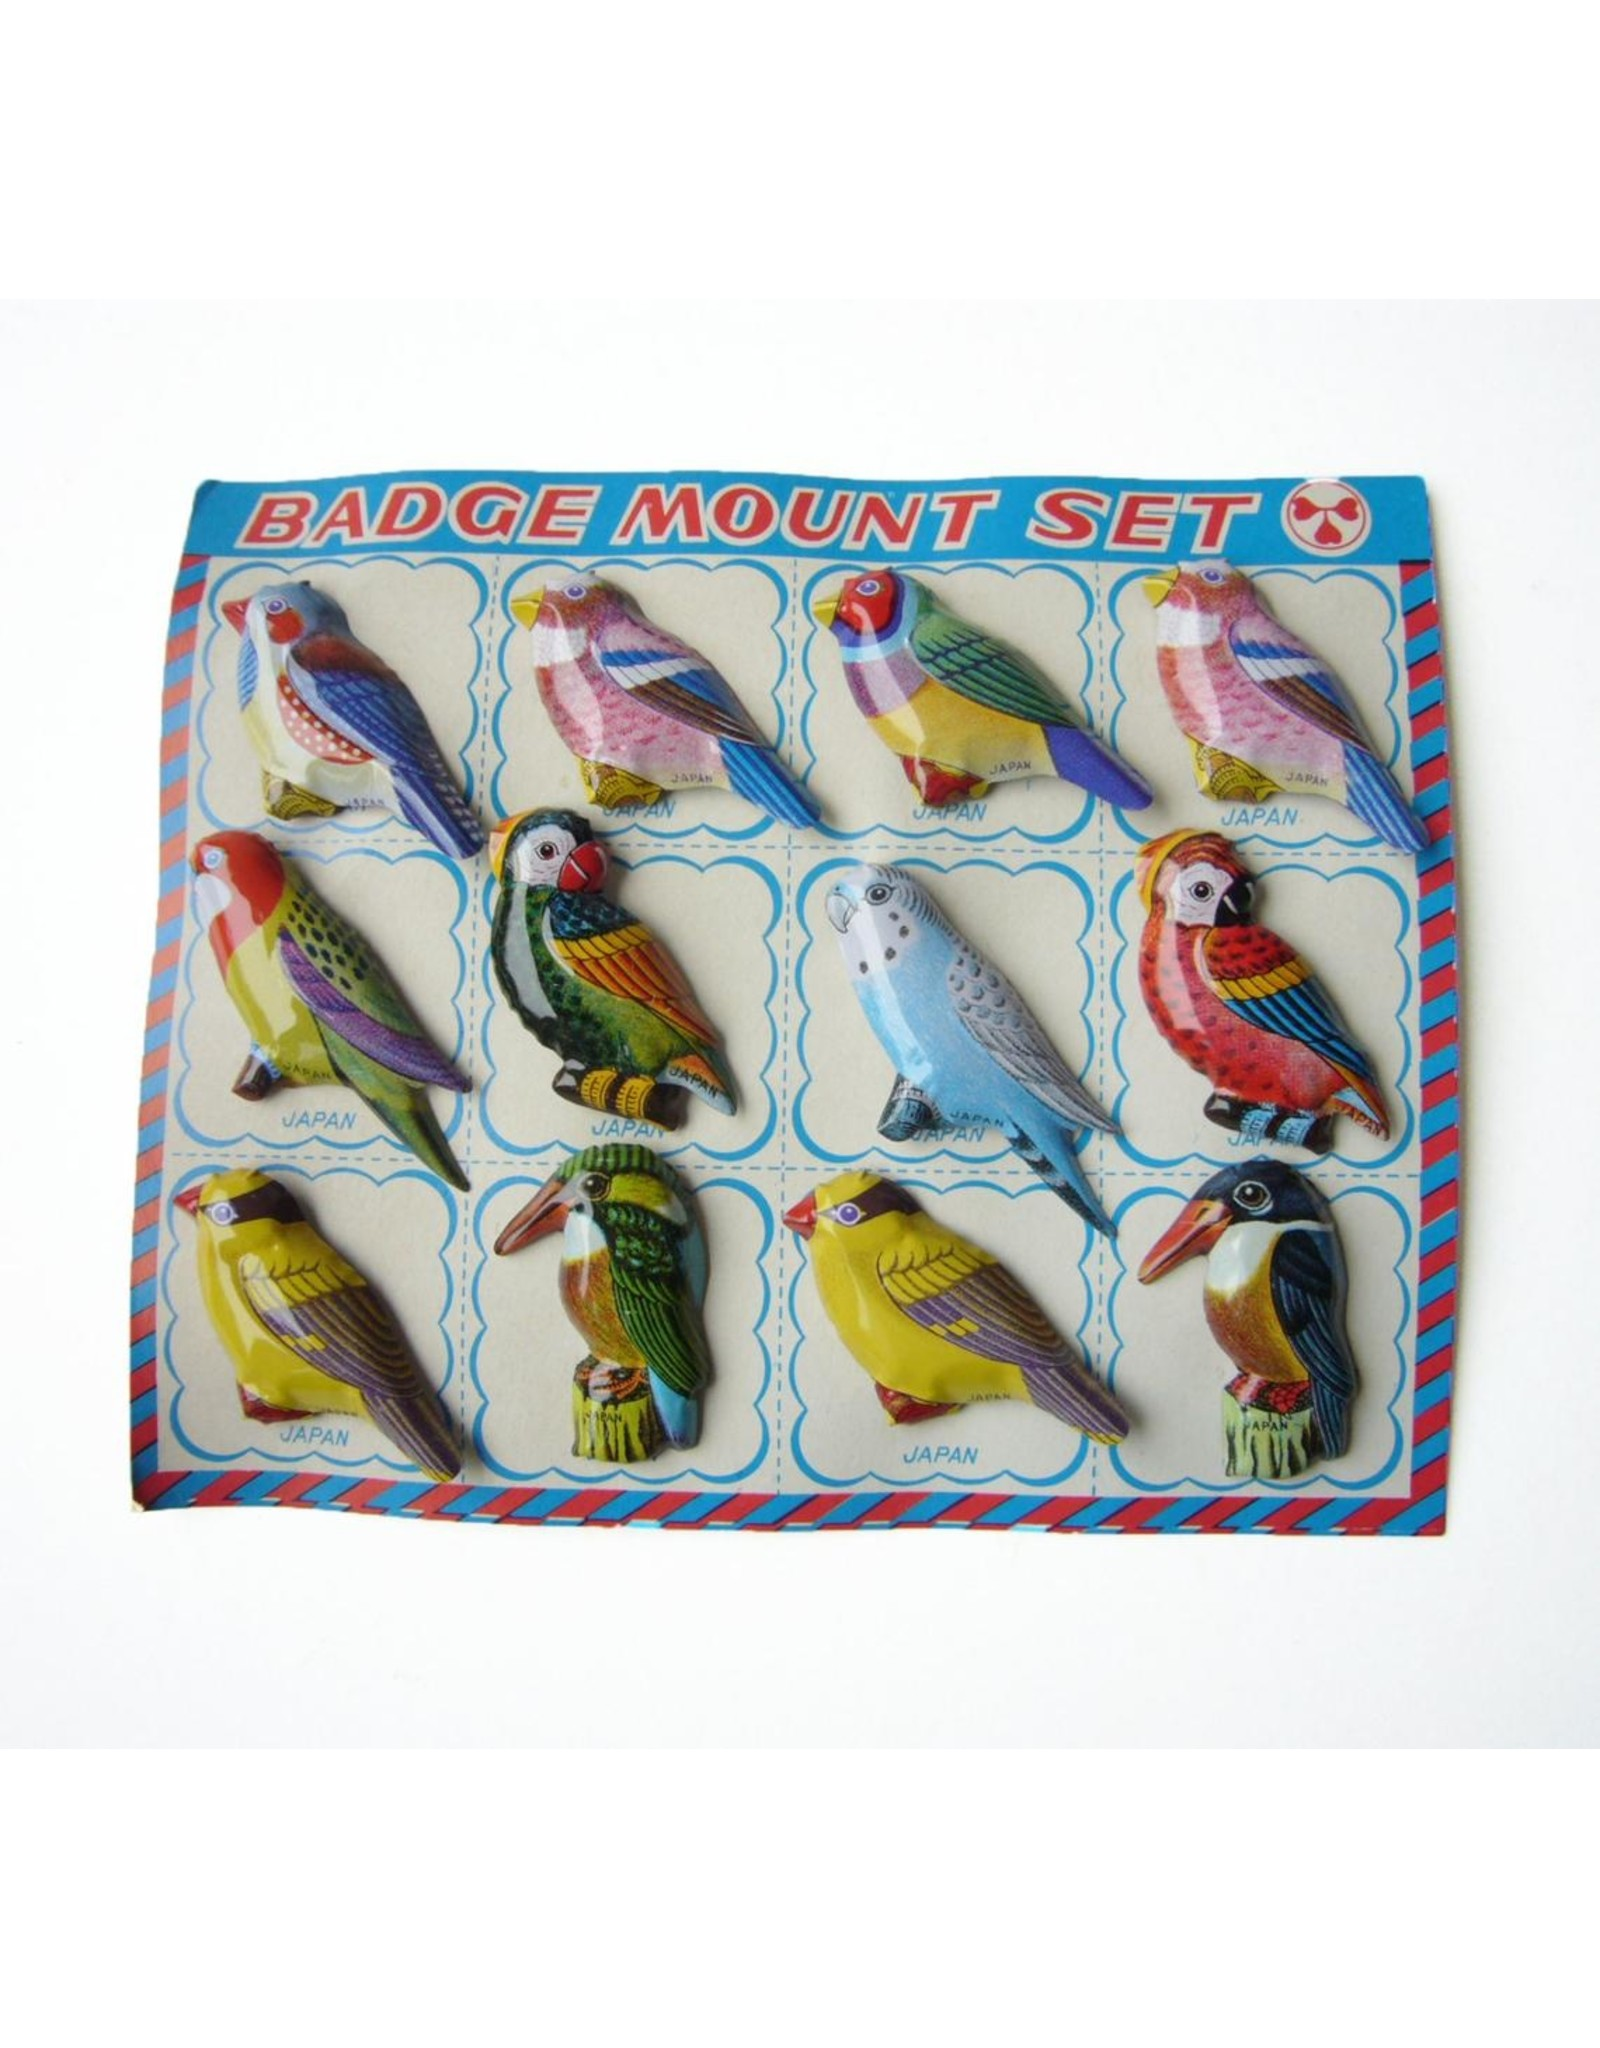 Vintage vogel broches (prijs per 12)